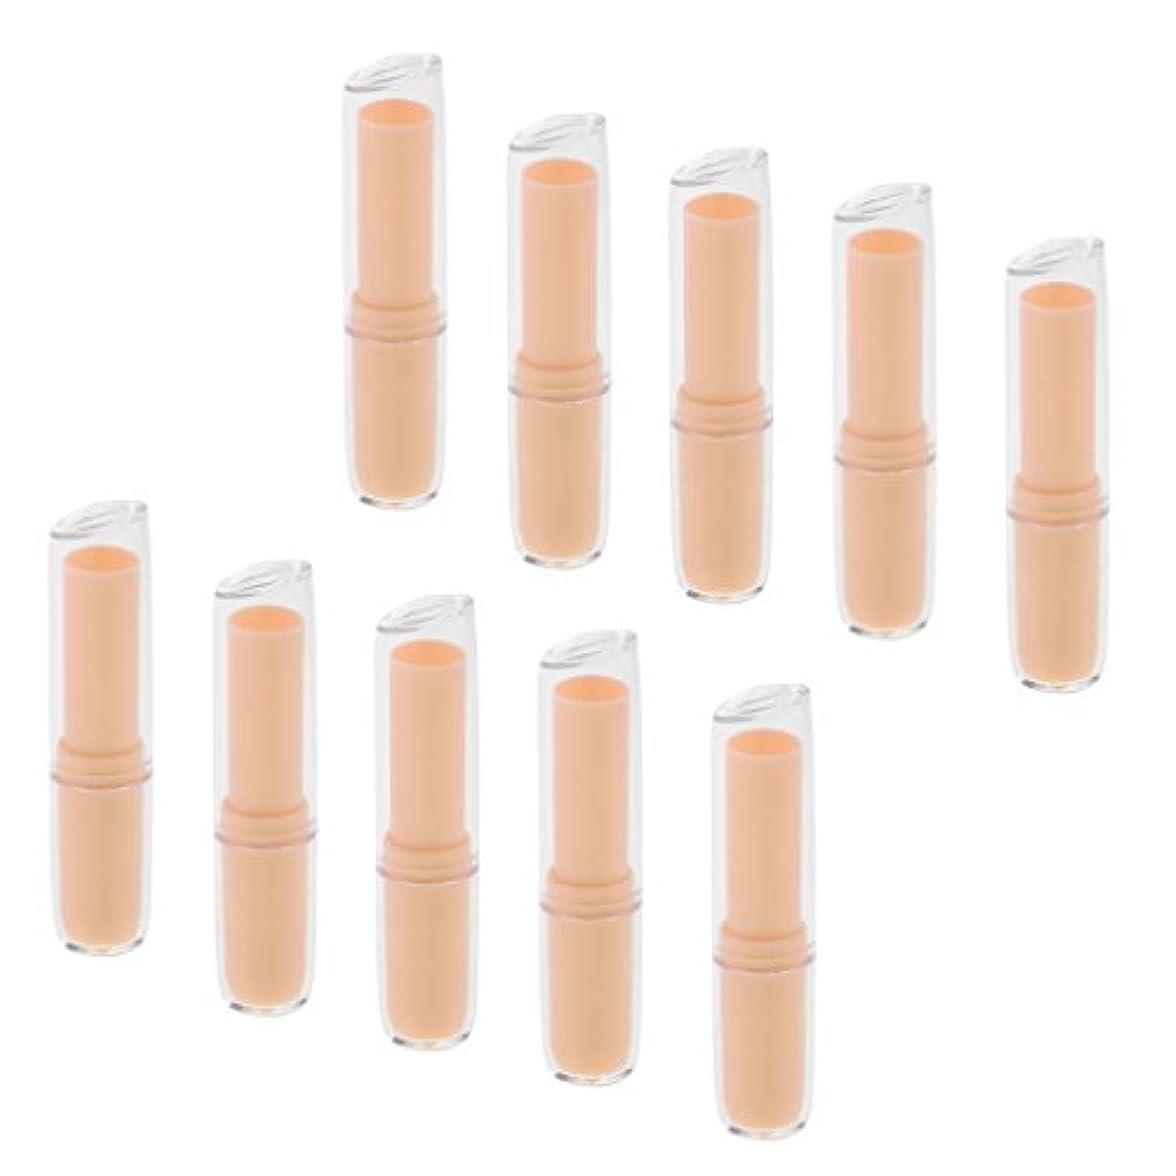 Toygogo 10個の空の口紅チューブリップクリーム容器DIY化粧品メイクアップツール